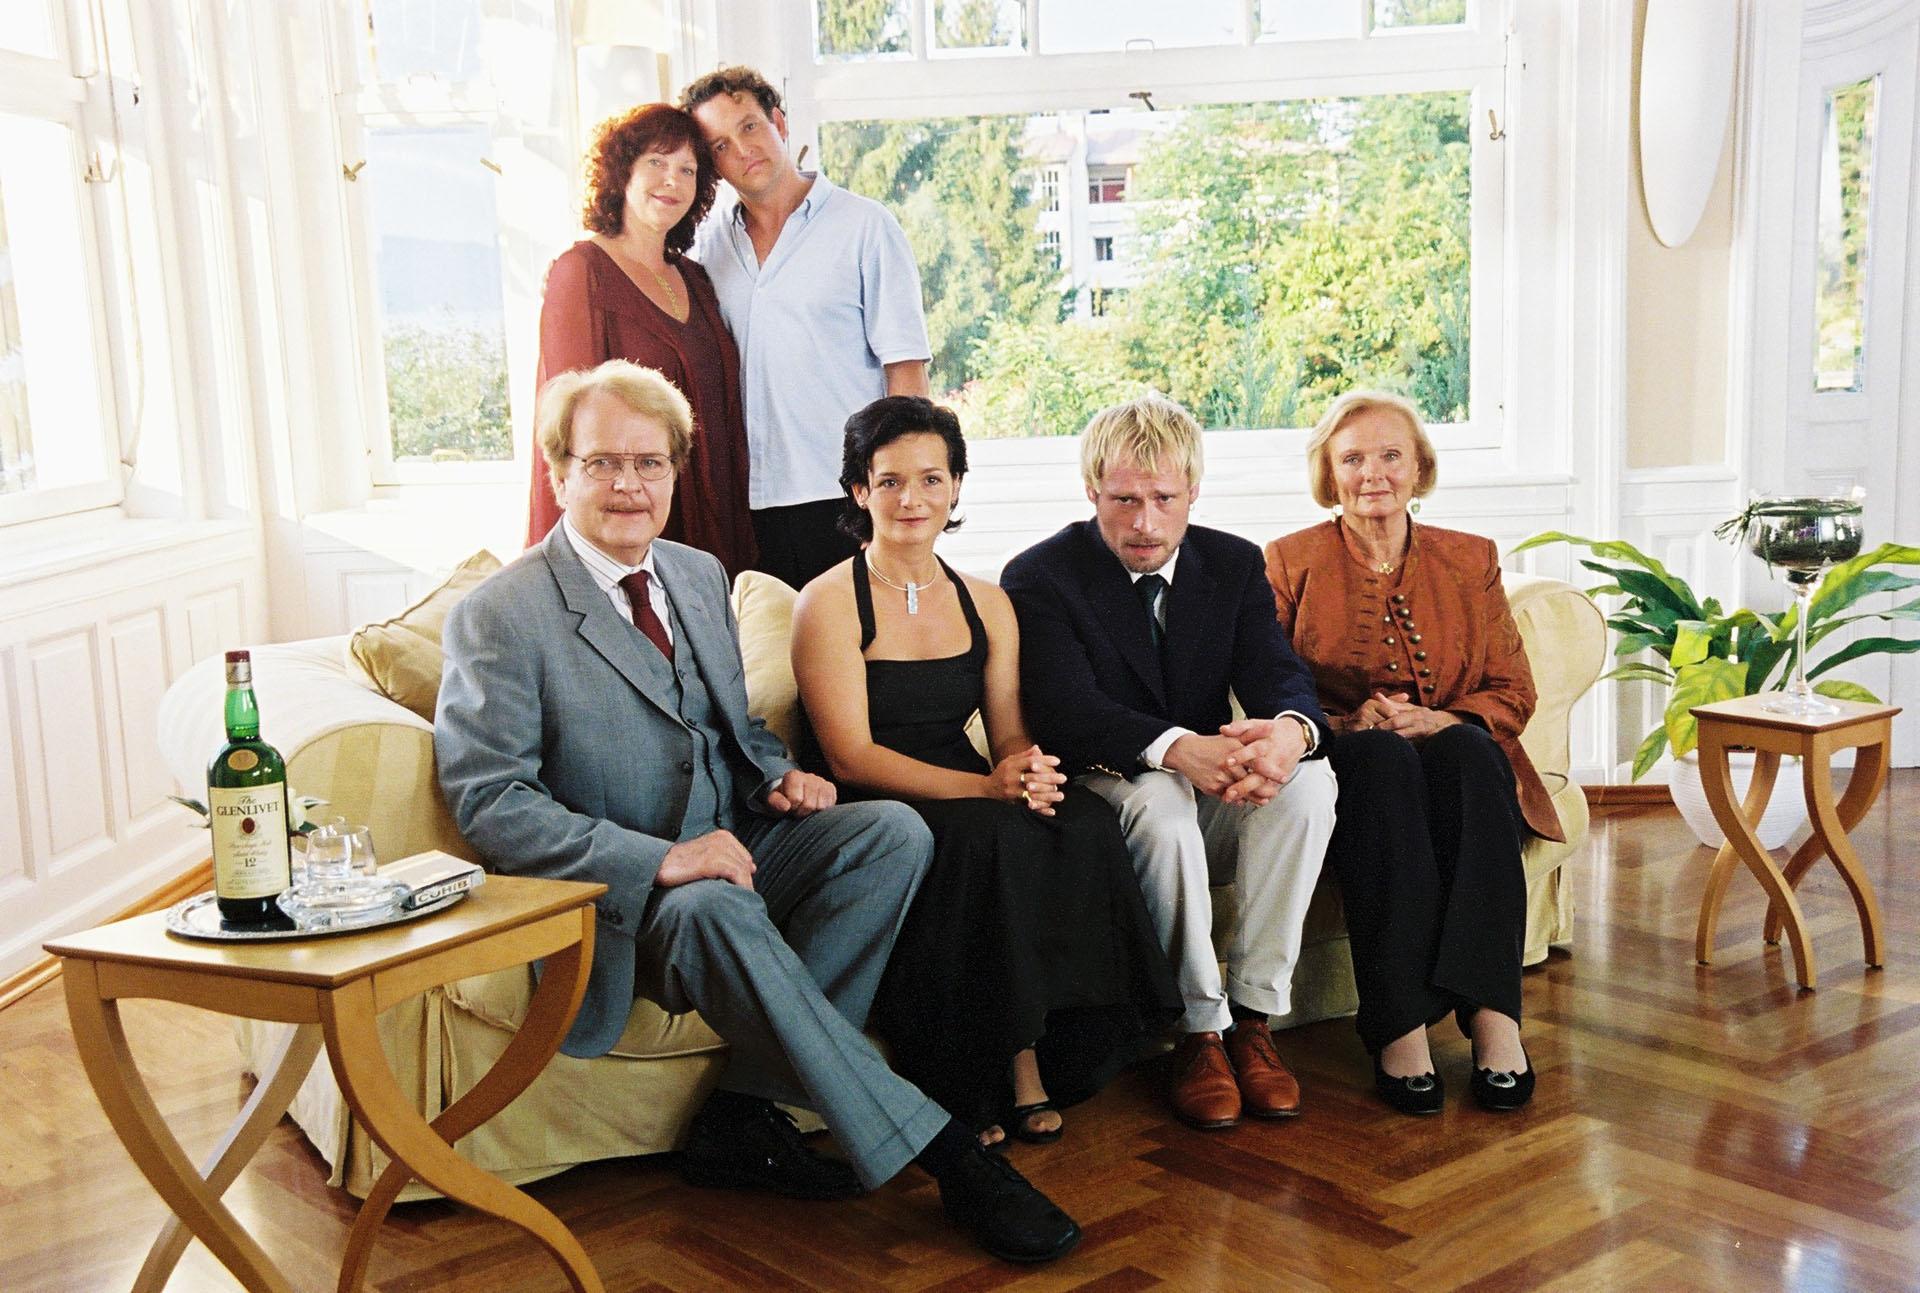 © Star*Film / Wolfgang Fuhrmann (Star*Film) - Elfi Eschke, Marco Rima, Peter Fricke, Katharina Stemberger, Johannes Krisch, Ruth Maria Kubitschek